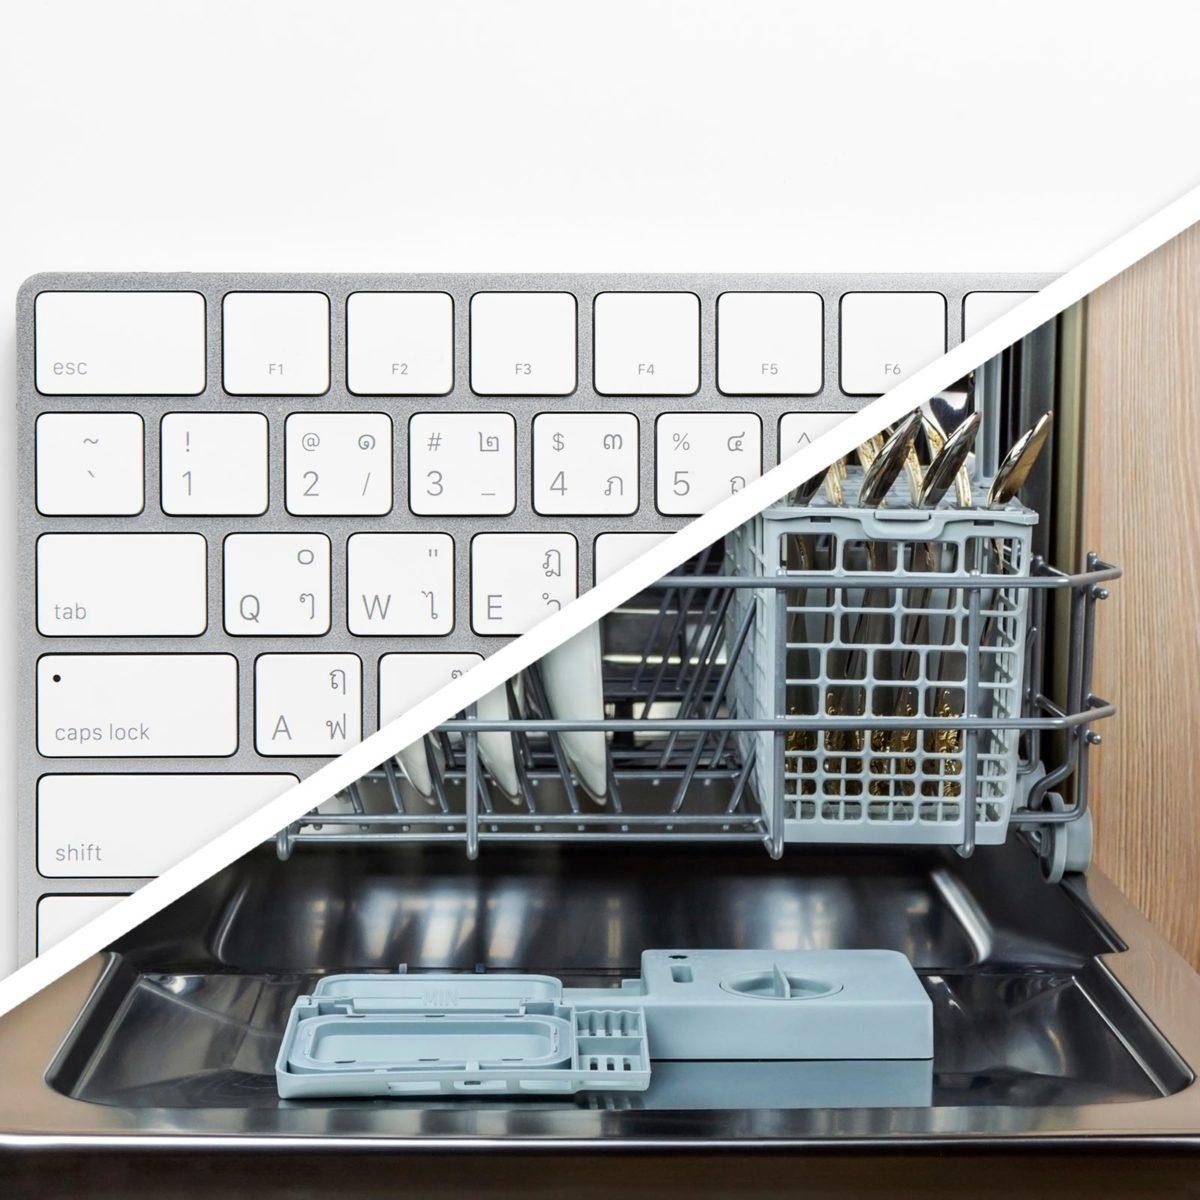 Keyboard and dishwasher